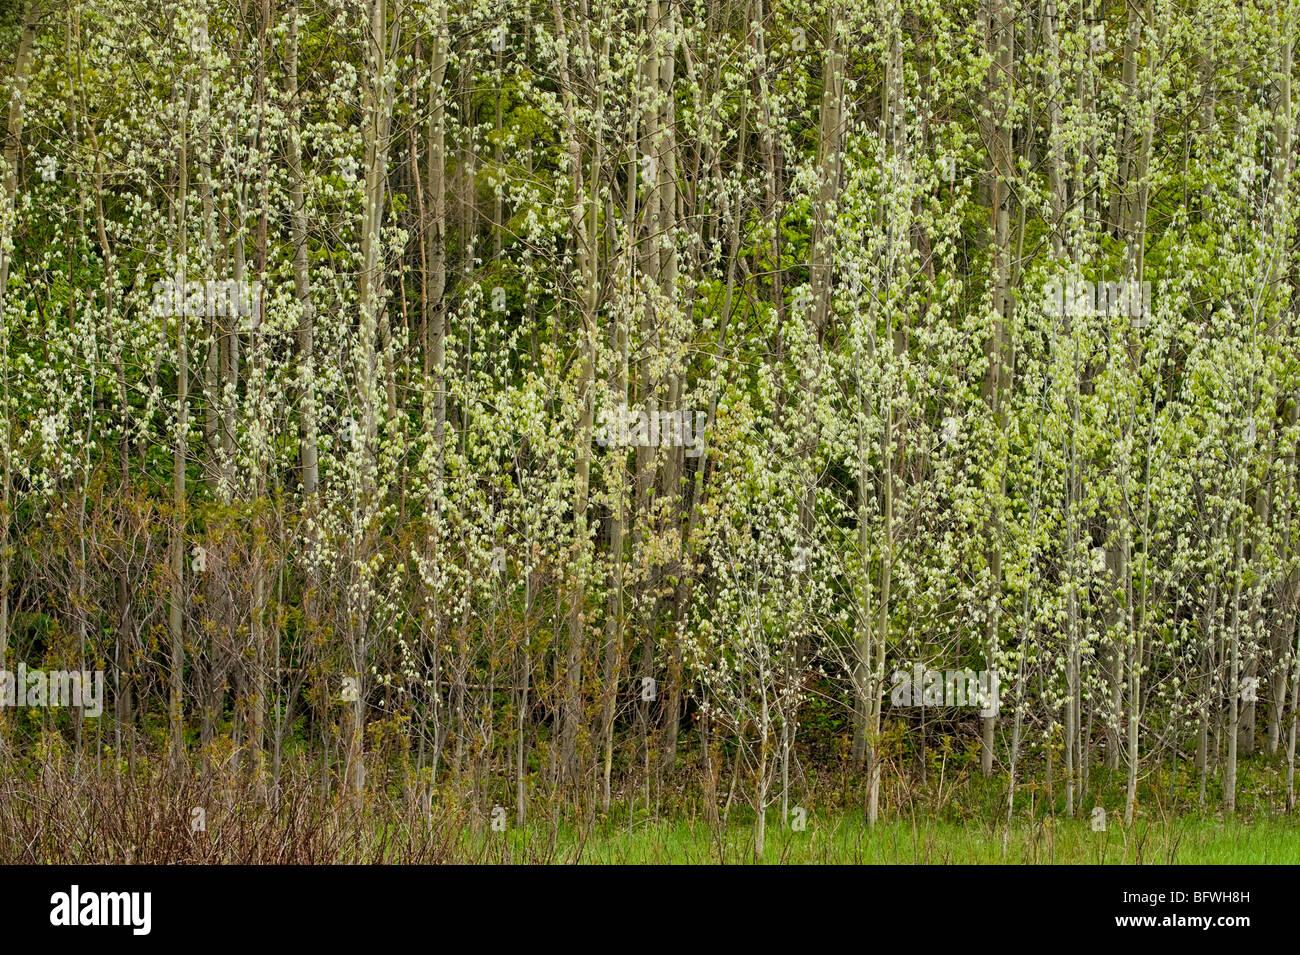 New foliage in poplar grove, Greater Sudbury, Ontario, Canada - Stock Image